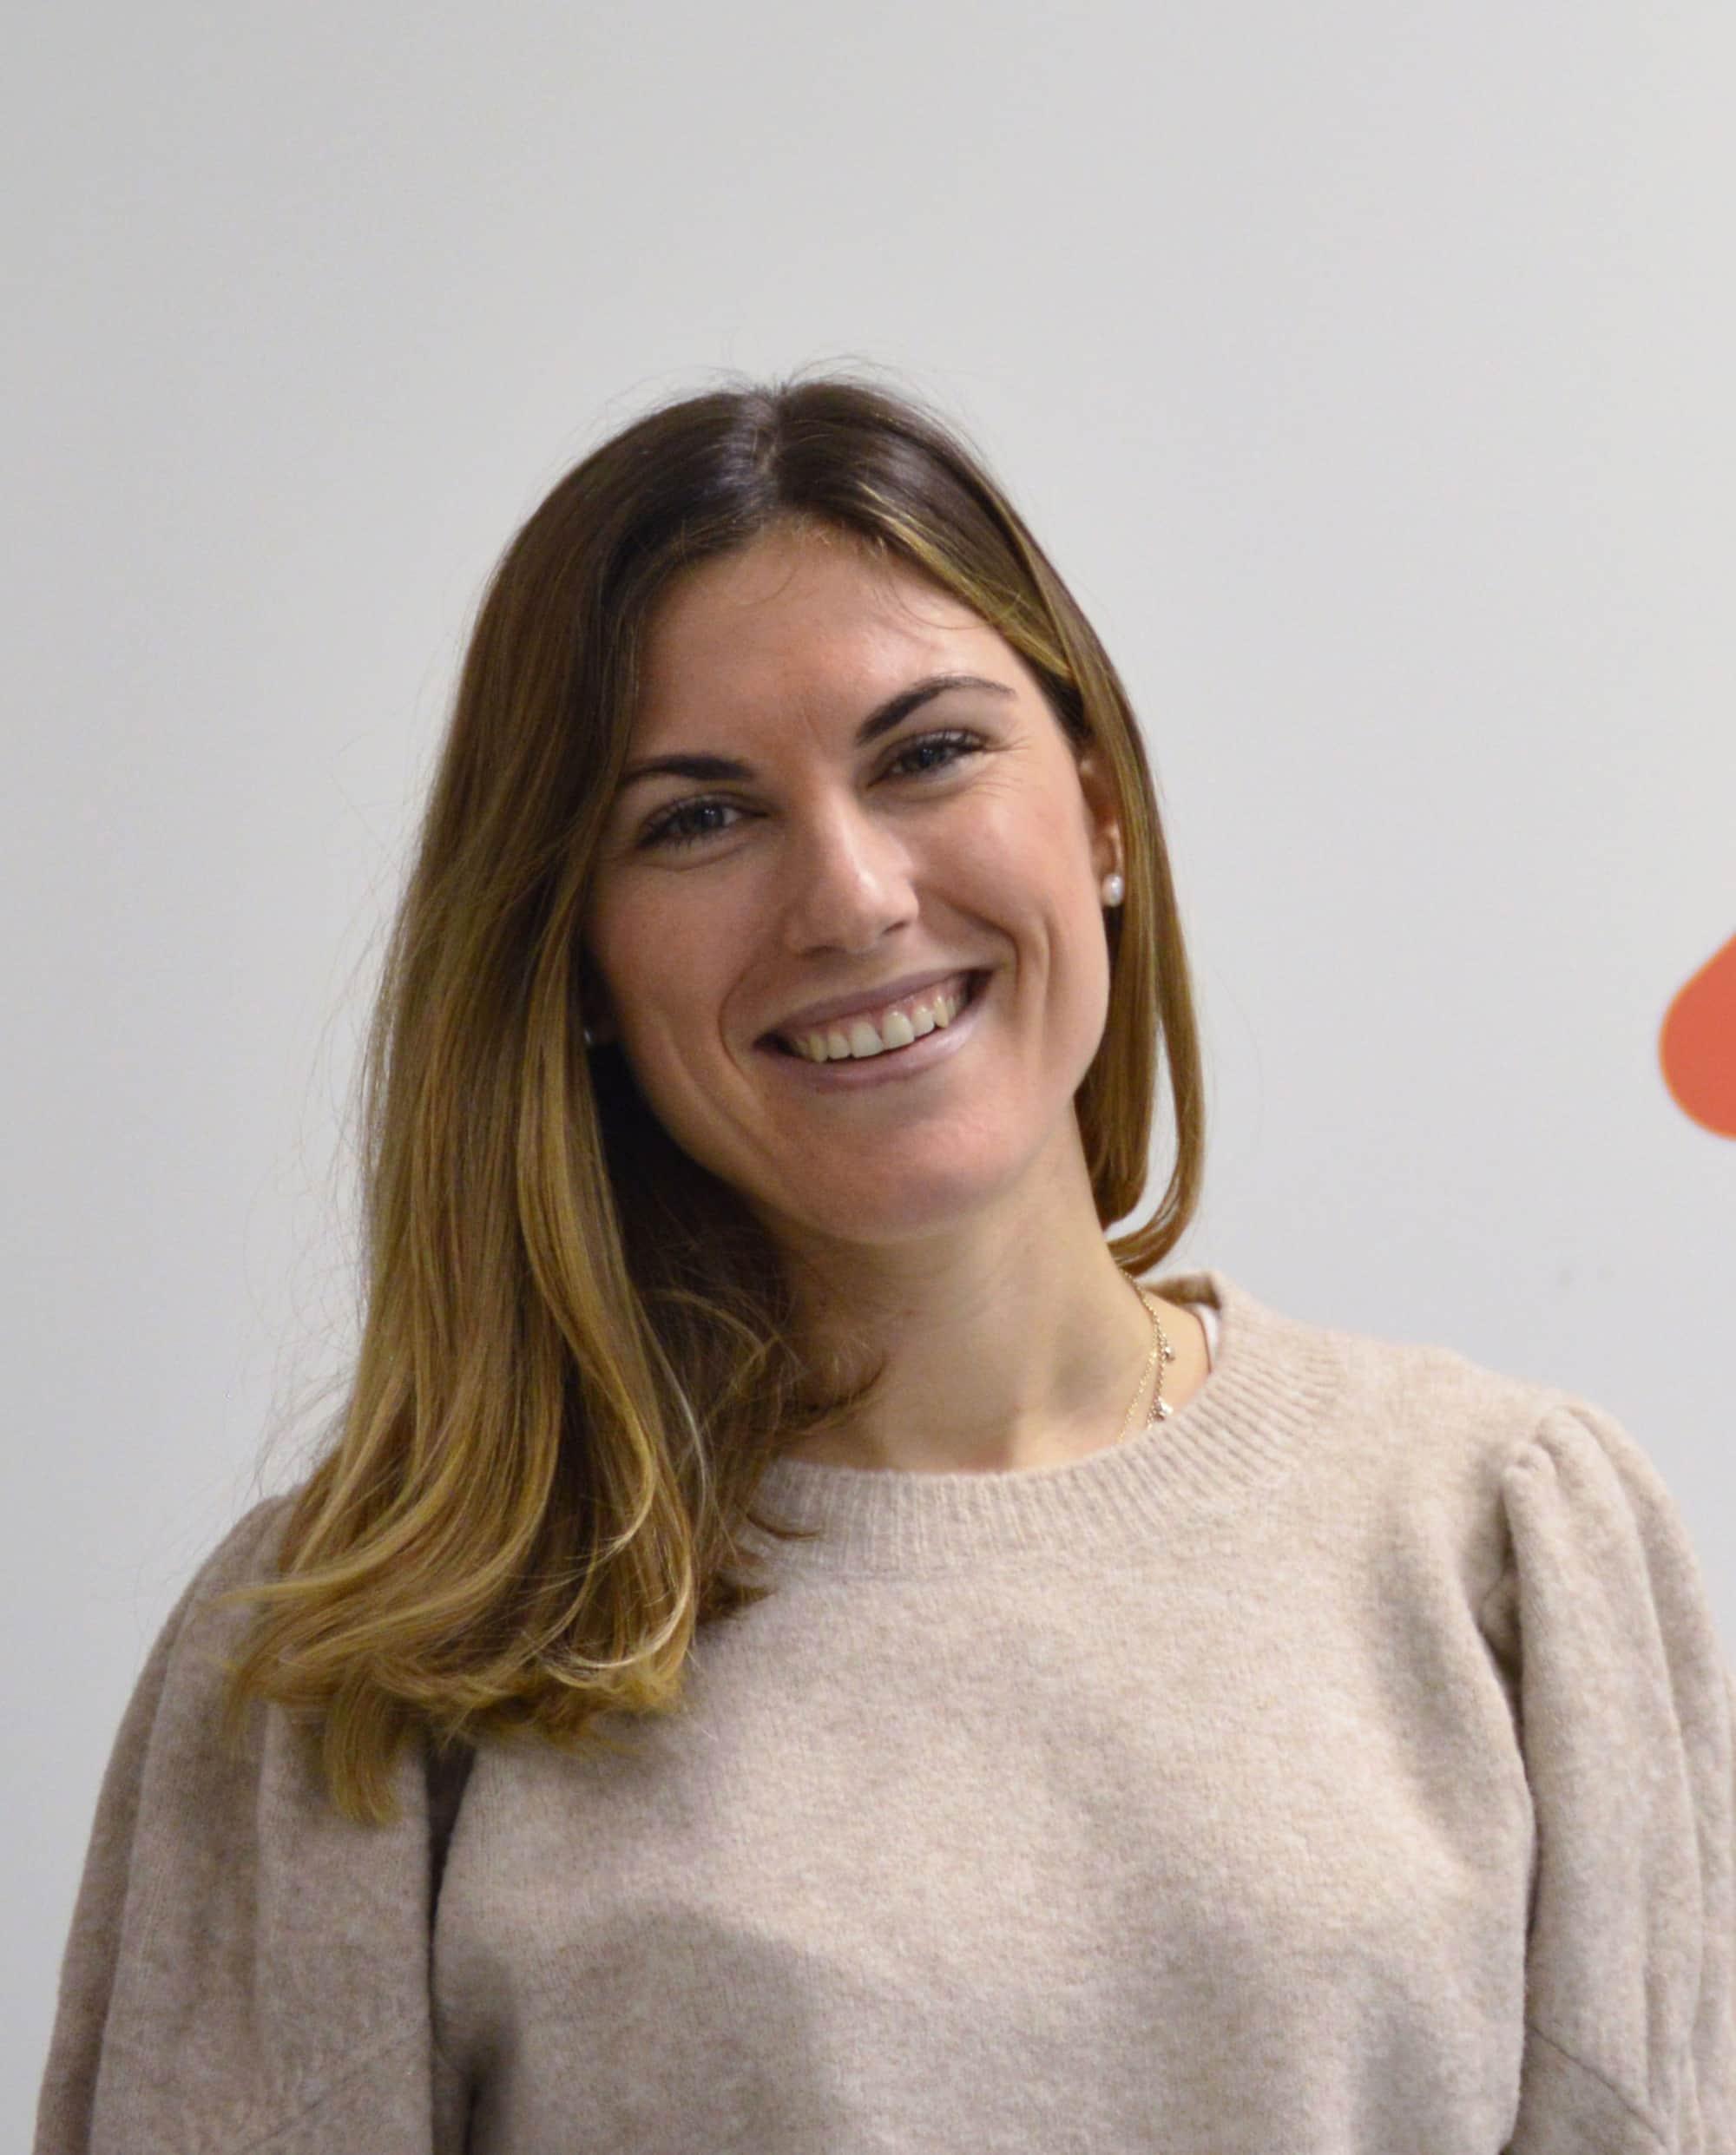 A portrait of Andrea Sanchez, the country success lead of F10 Spain